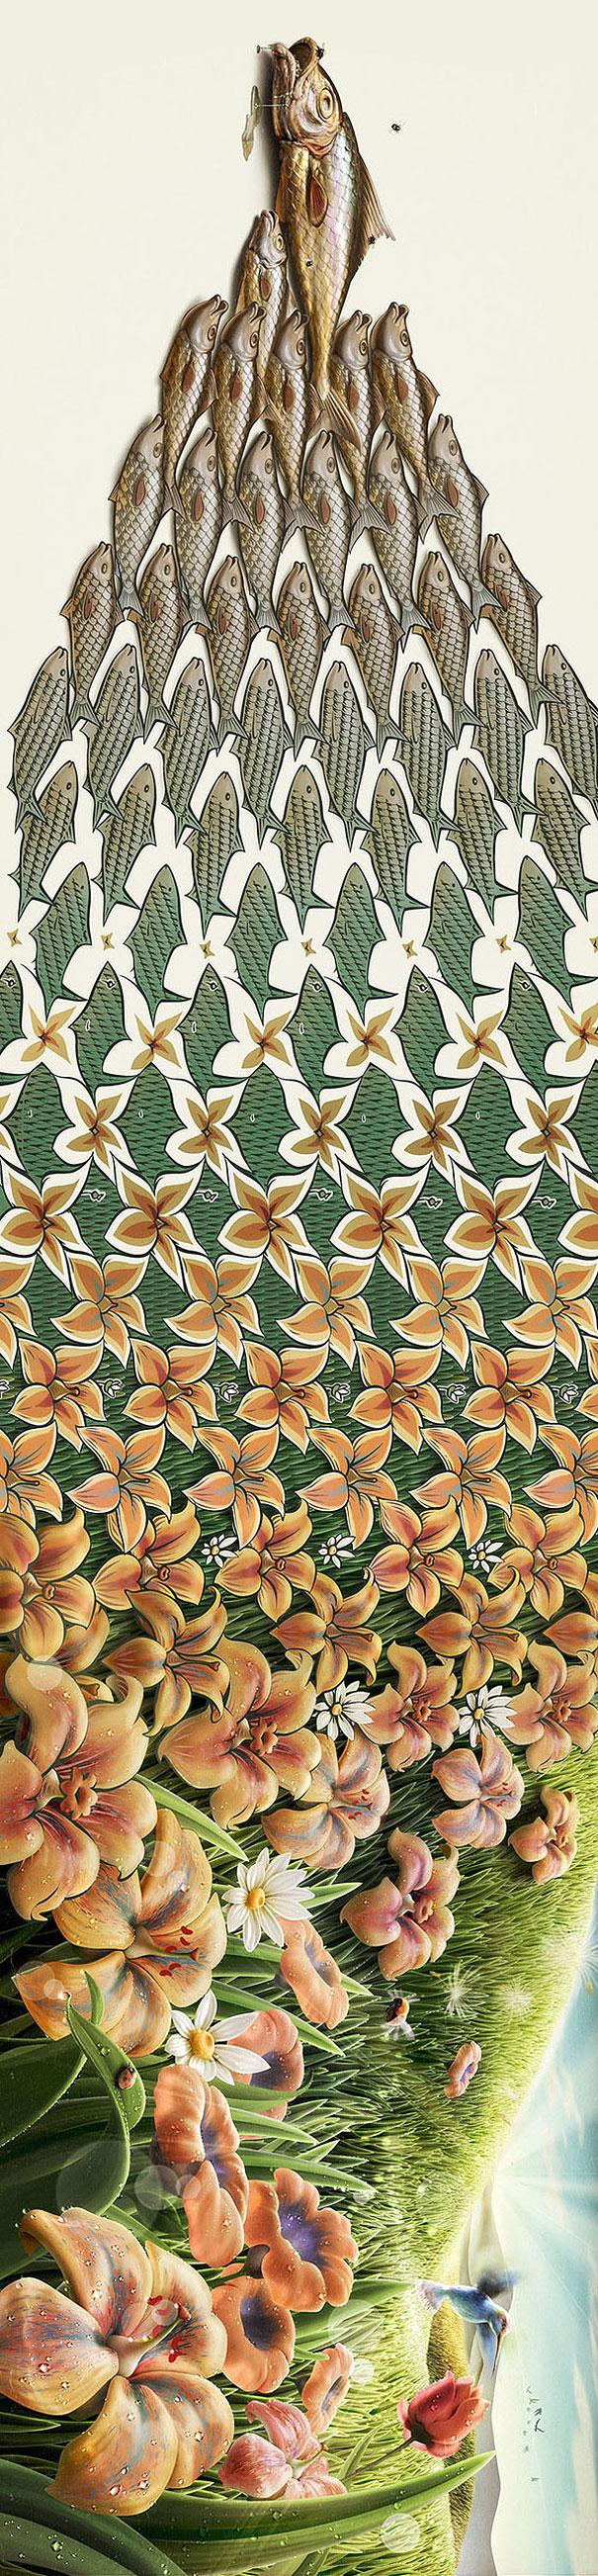 ad-plus-illustrations-oscar-ramos-1.jpg